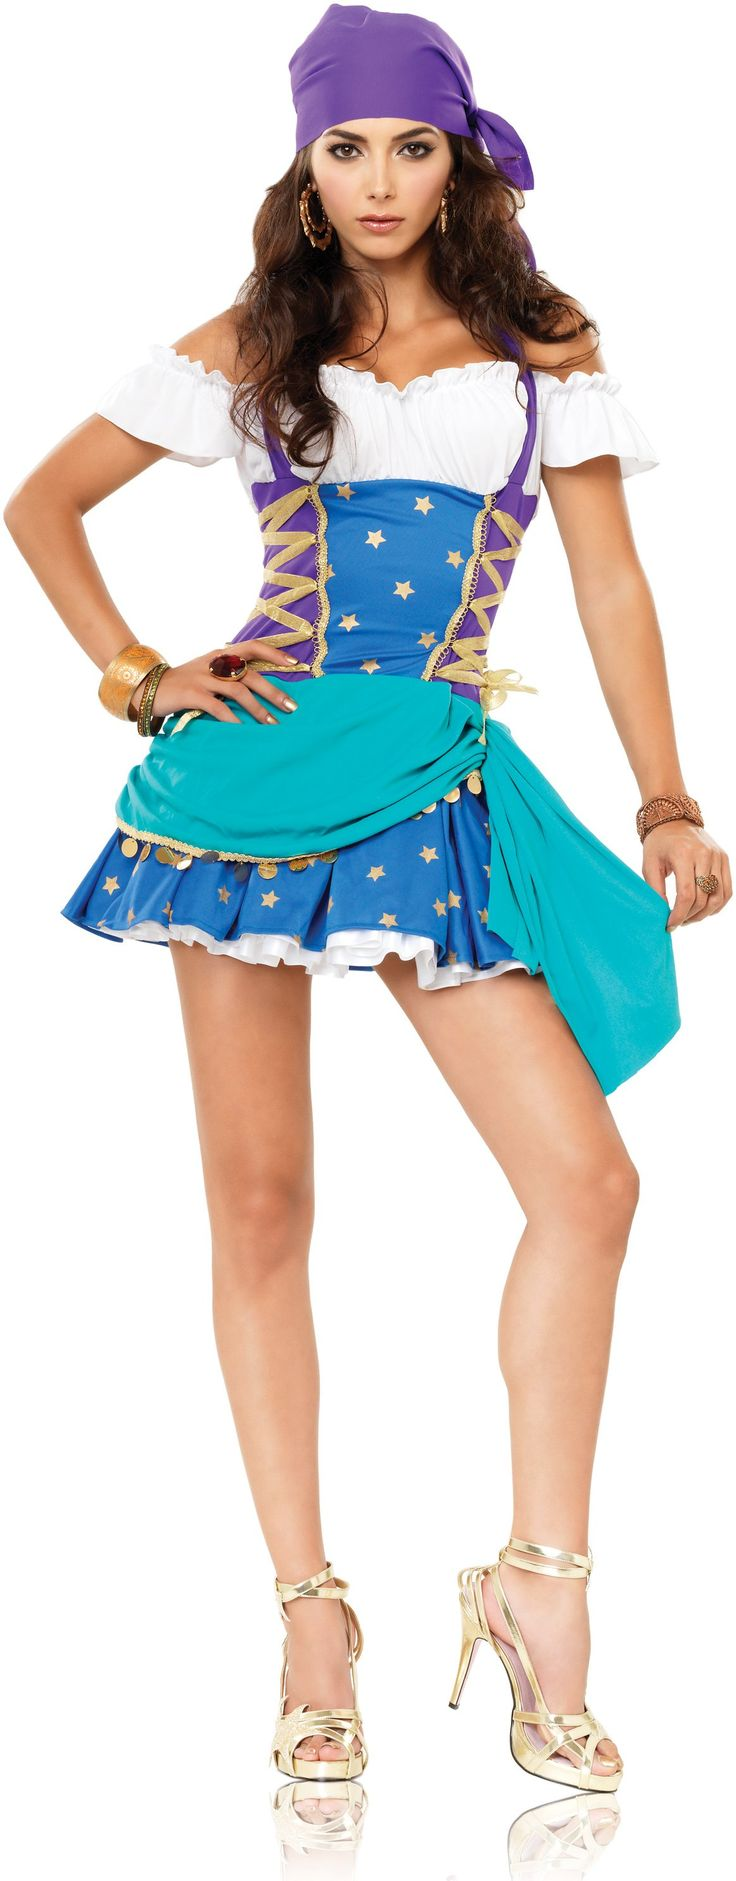 Gypsy Costume: Gypsy Princesses, Halloween Costumes, Adult Costumes, Women Costumes, Princesses Costumes, Legs Avenu, Gypsy Costumes, Costumes Ideas, Halter Dresses